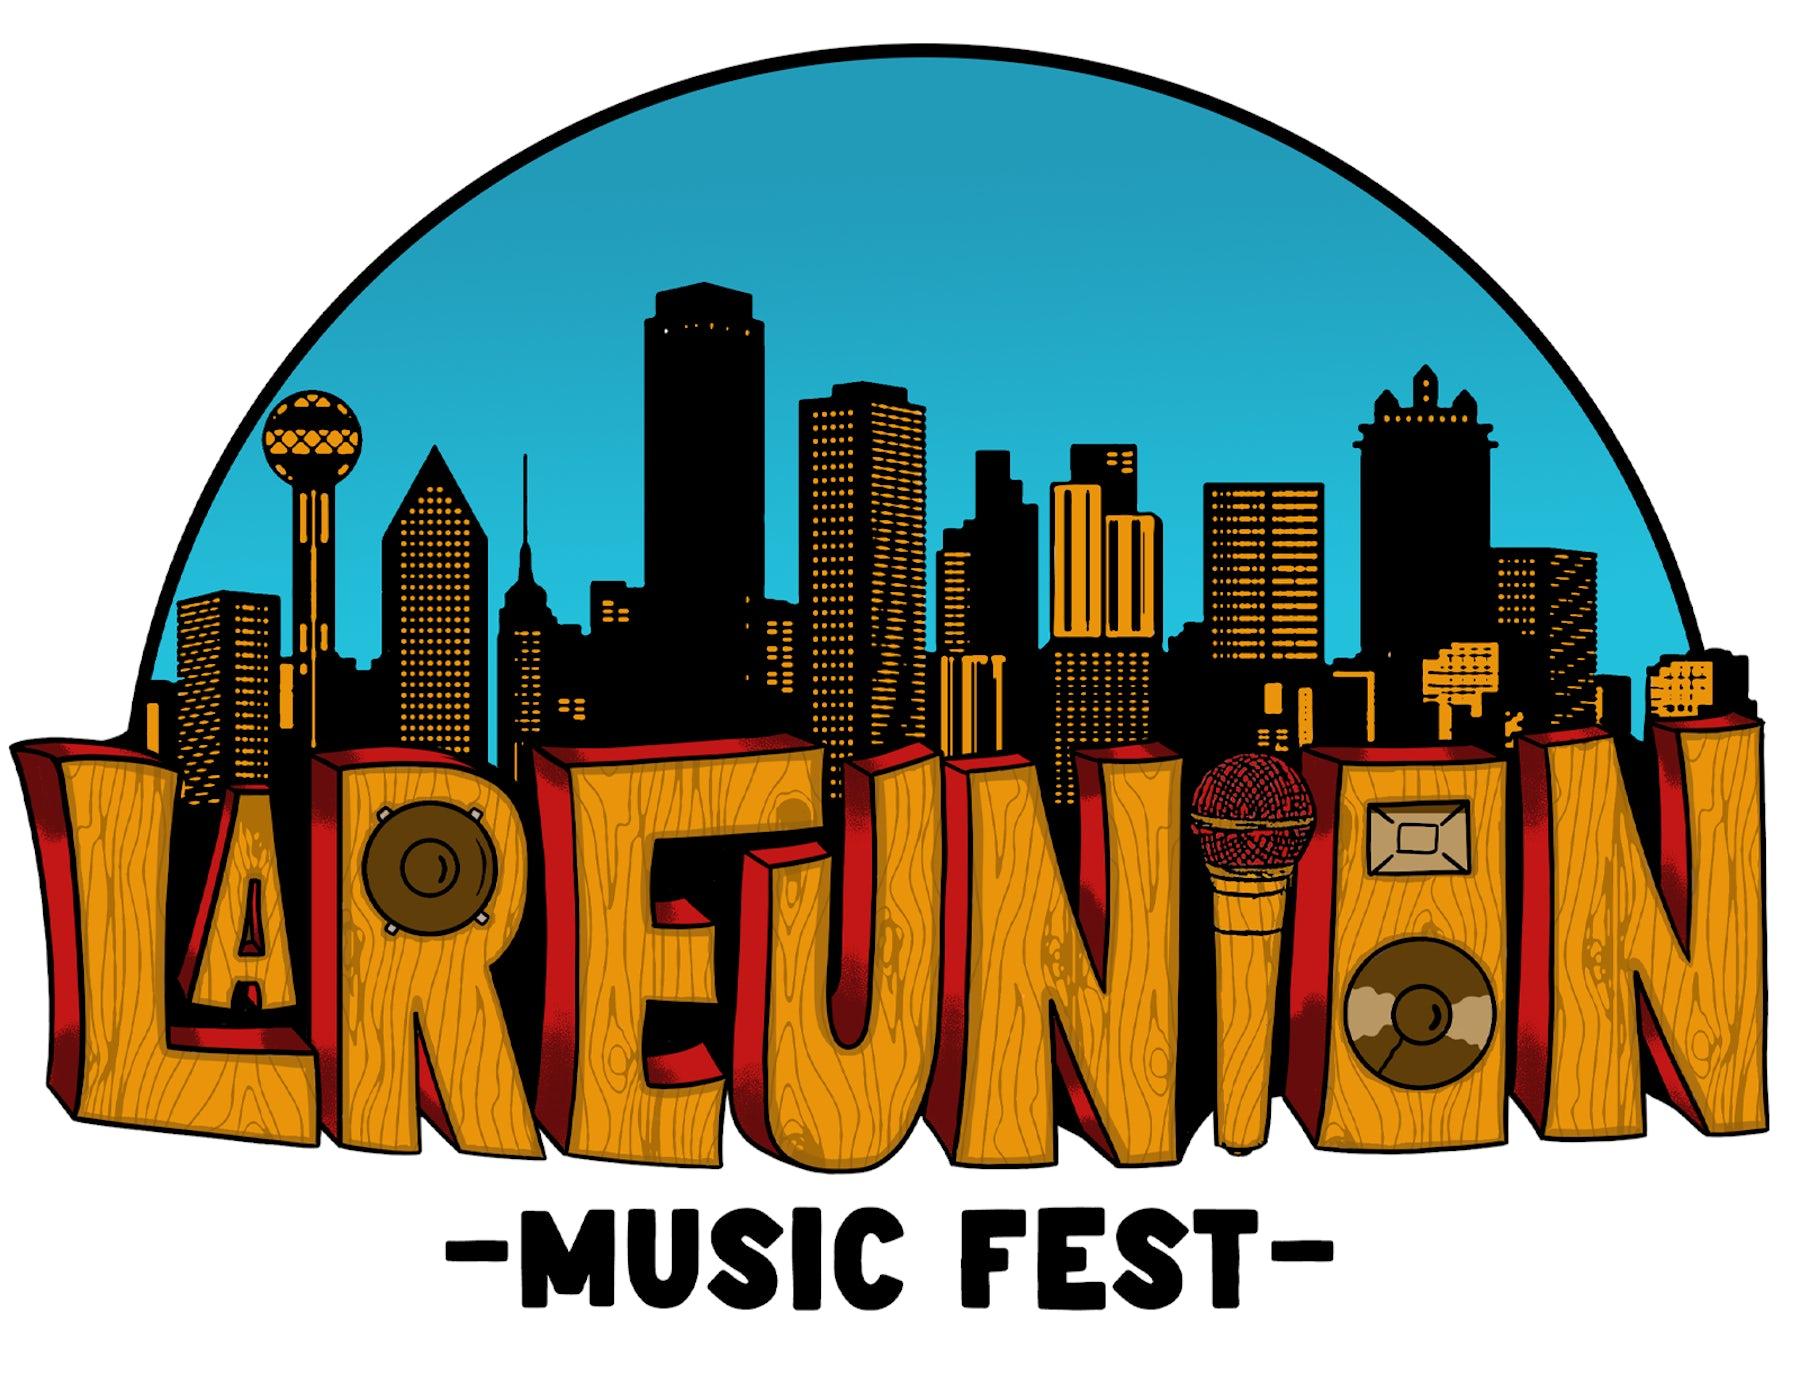 La Reunion Music Festival